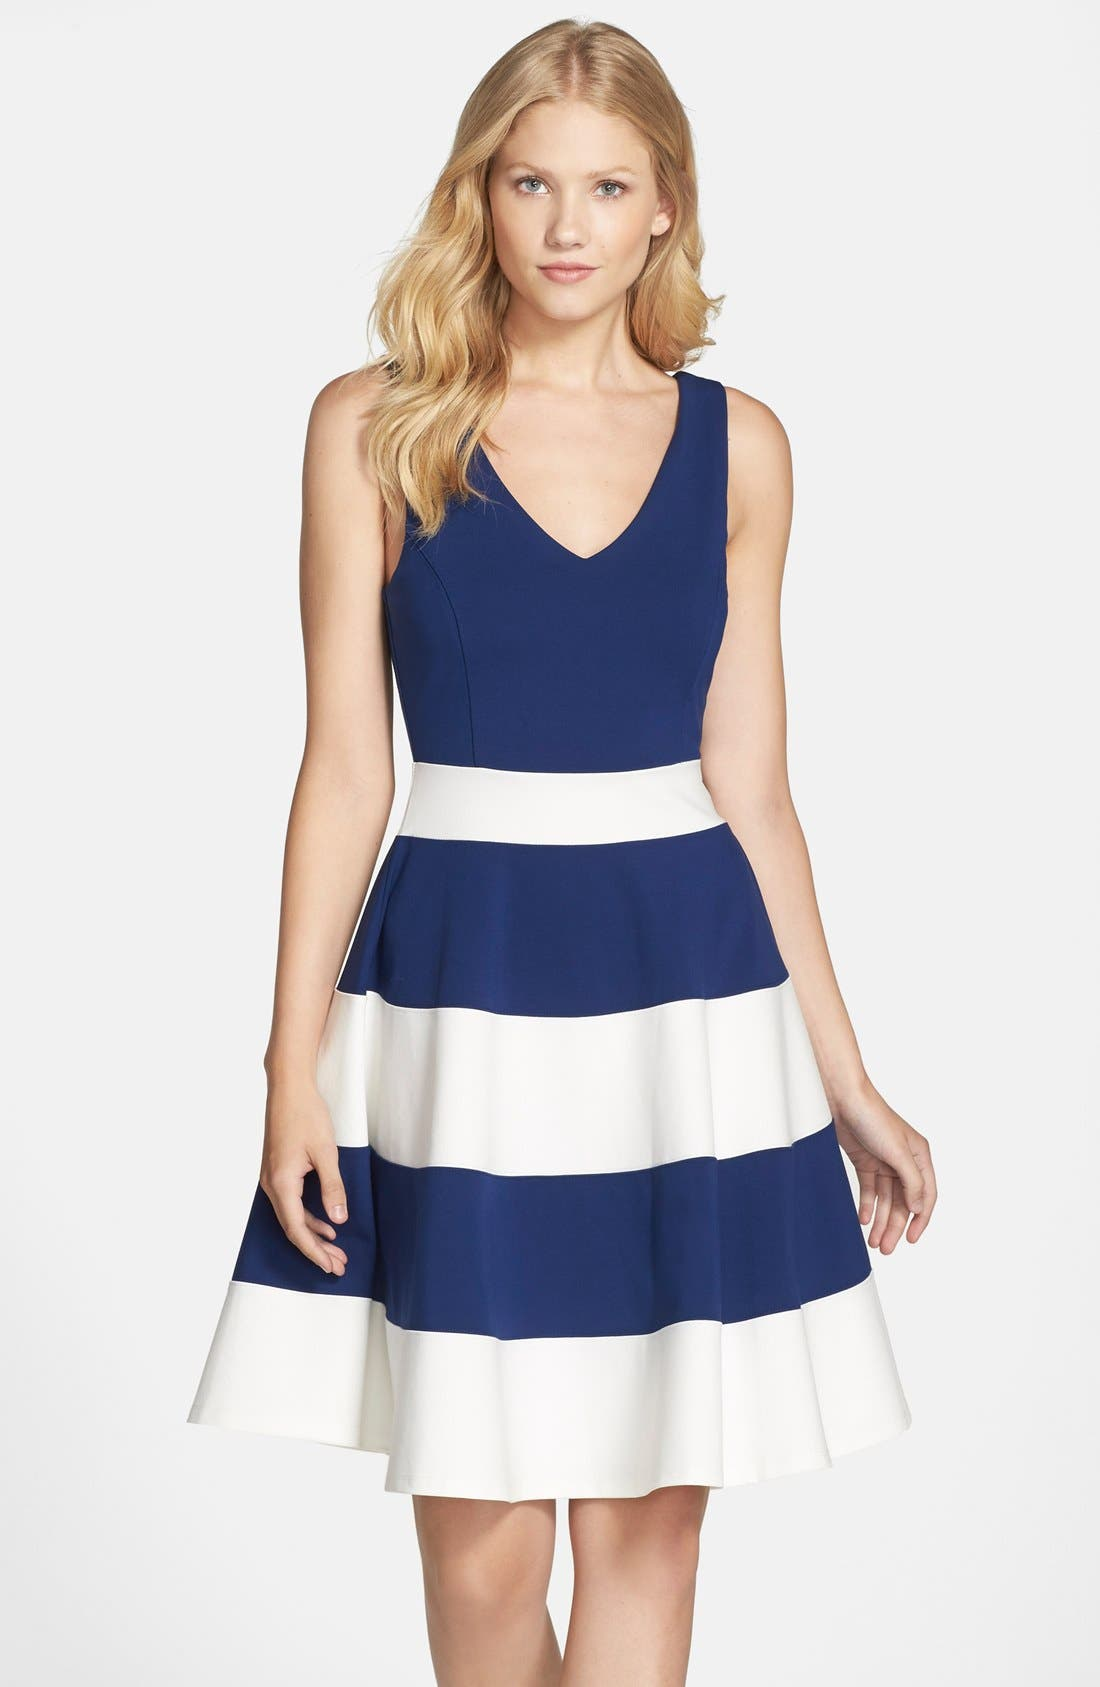 Joice Sleeveless Fit & Flare Dress,                         Main,                         color, NAVY/ WHITE